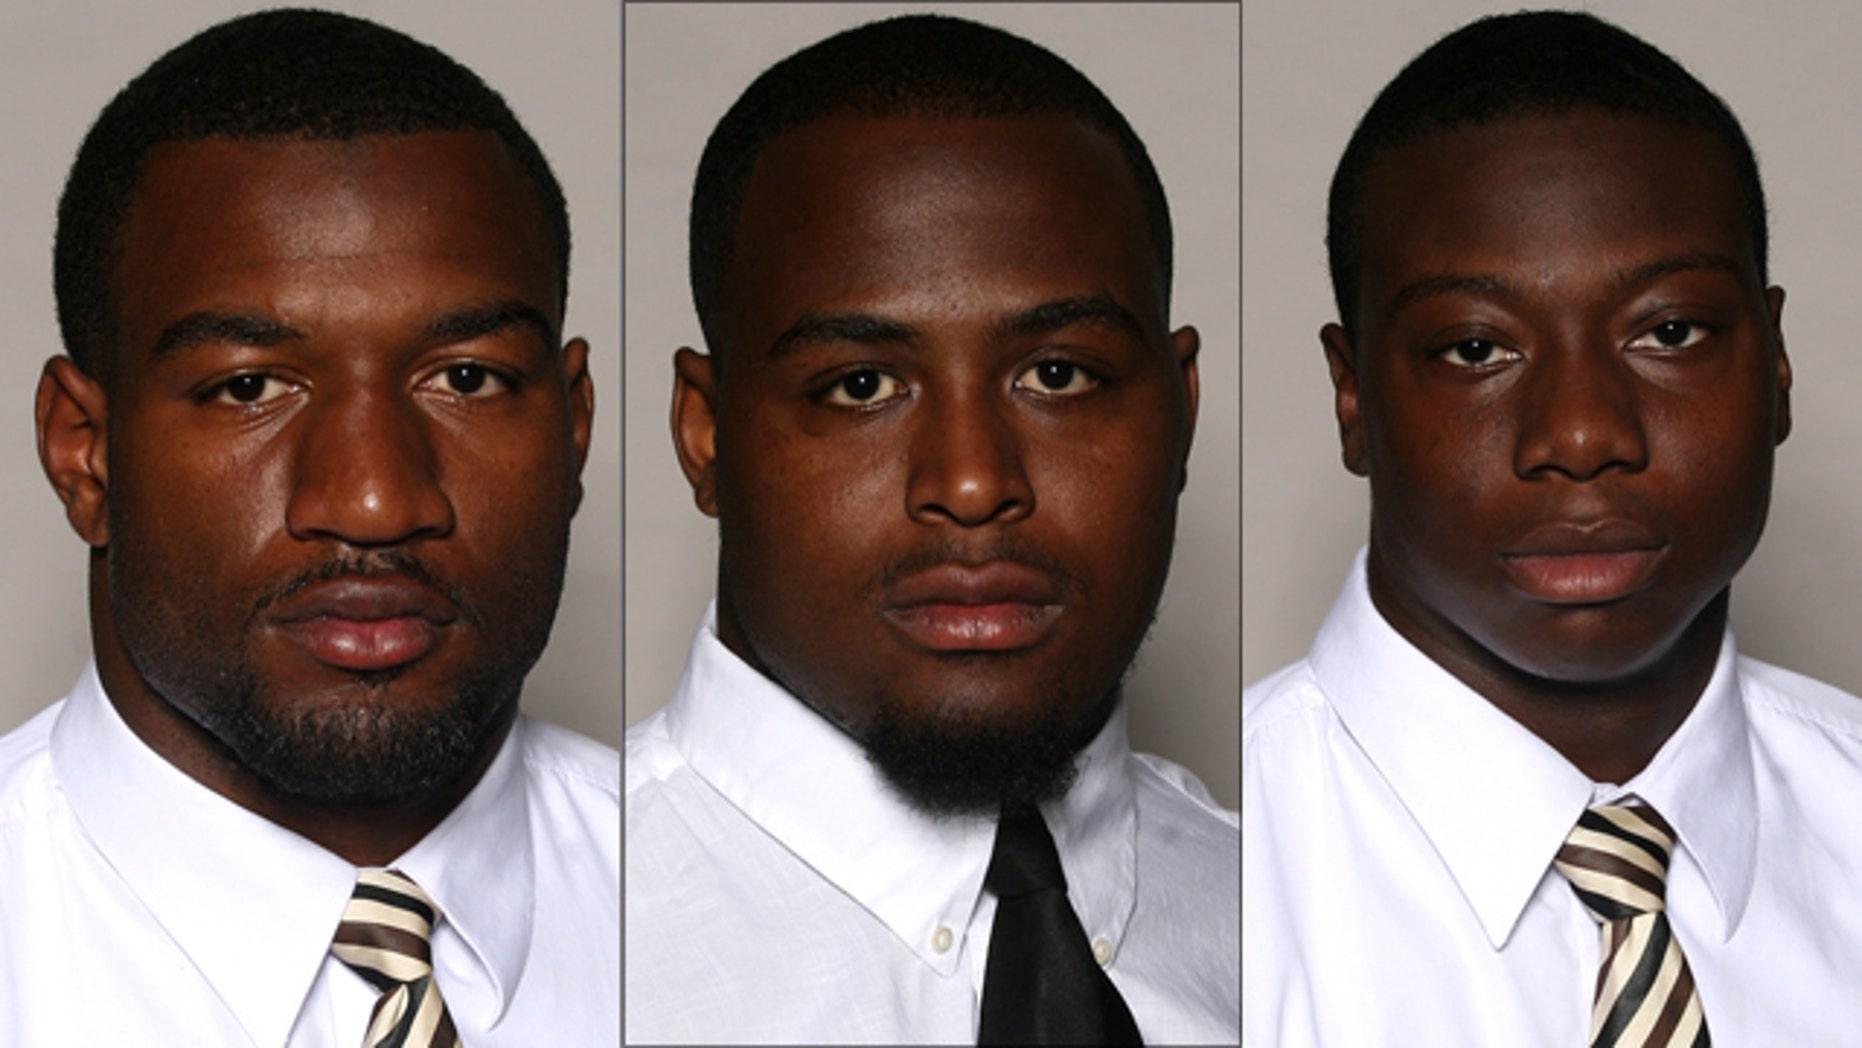 Martez Smith, left, Deddrick Jones, center, and Tim Green were shot during a fight at a Mississippi nightclub.